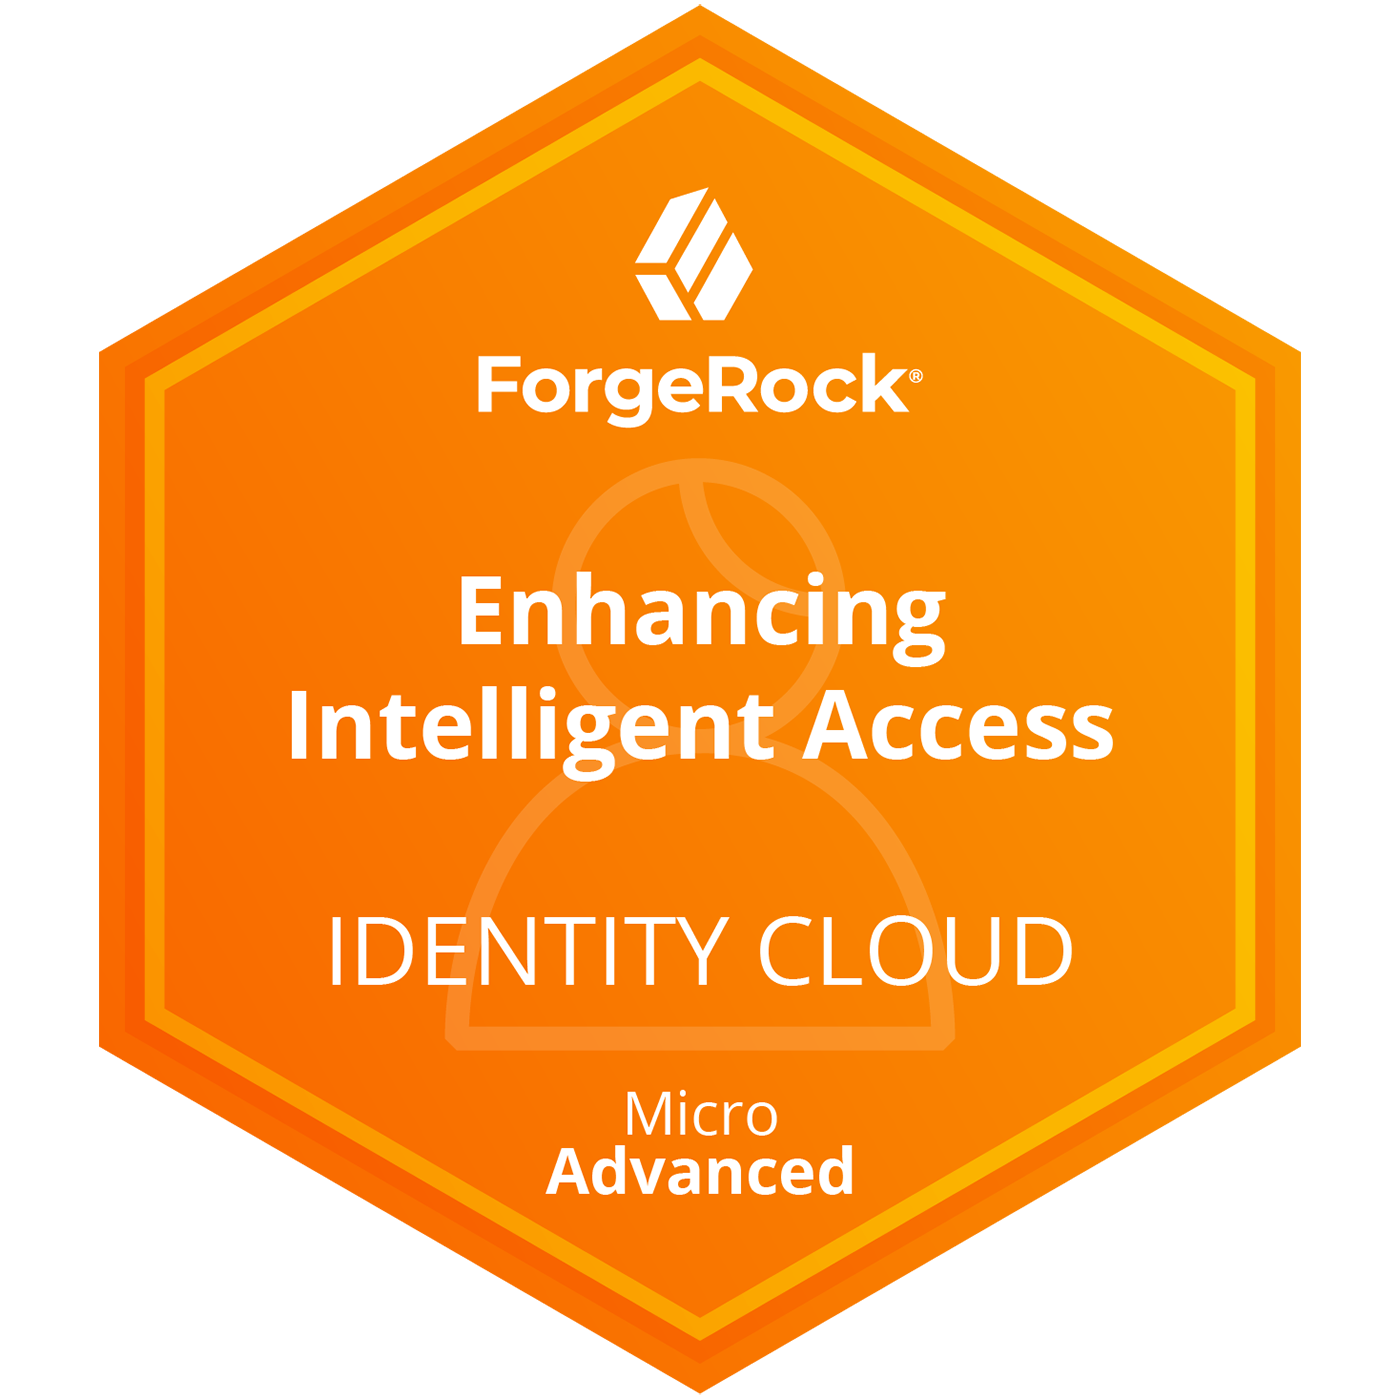 ForgeRock Identity Cloud: Access Management Micro Advanced Skills - Enhancing Intelligent Access